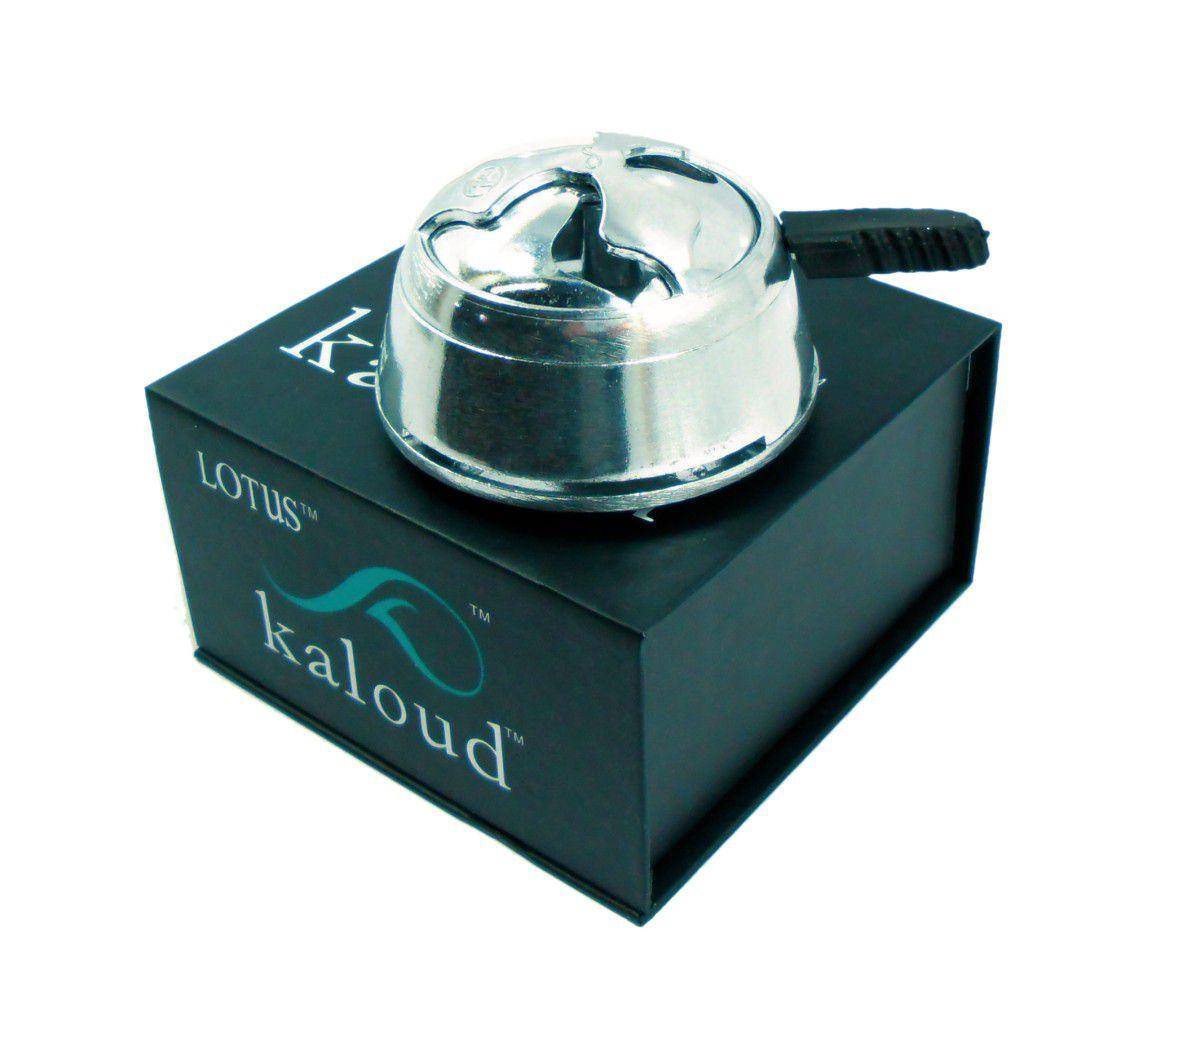 Controlador de calor Kaloud Lotus ORIGINAL 7,5cm de diâmetro.